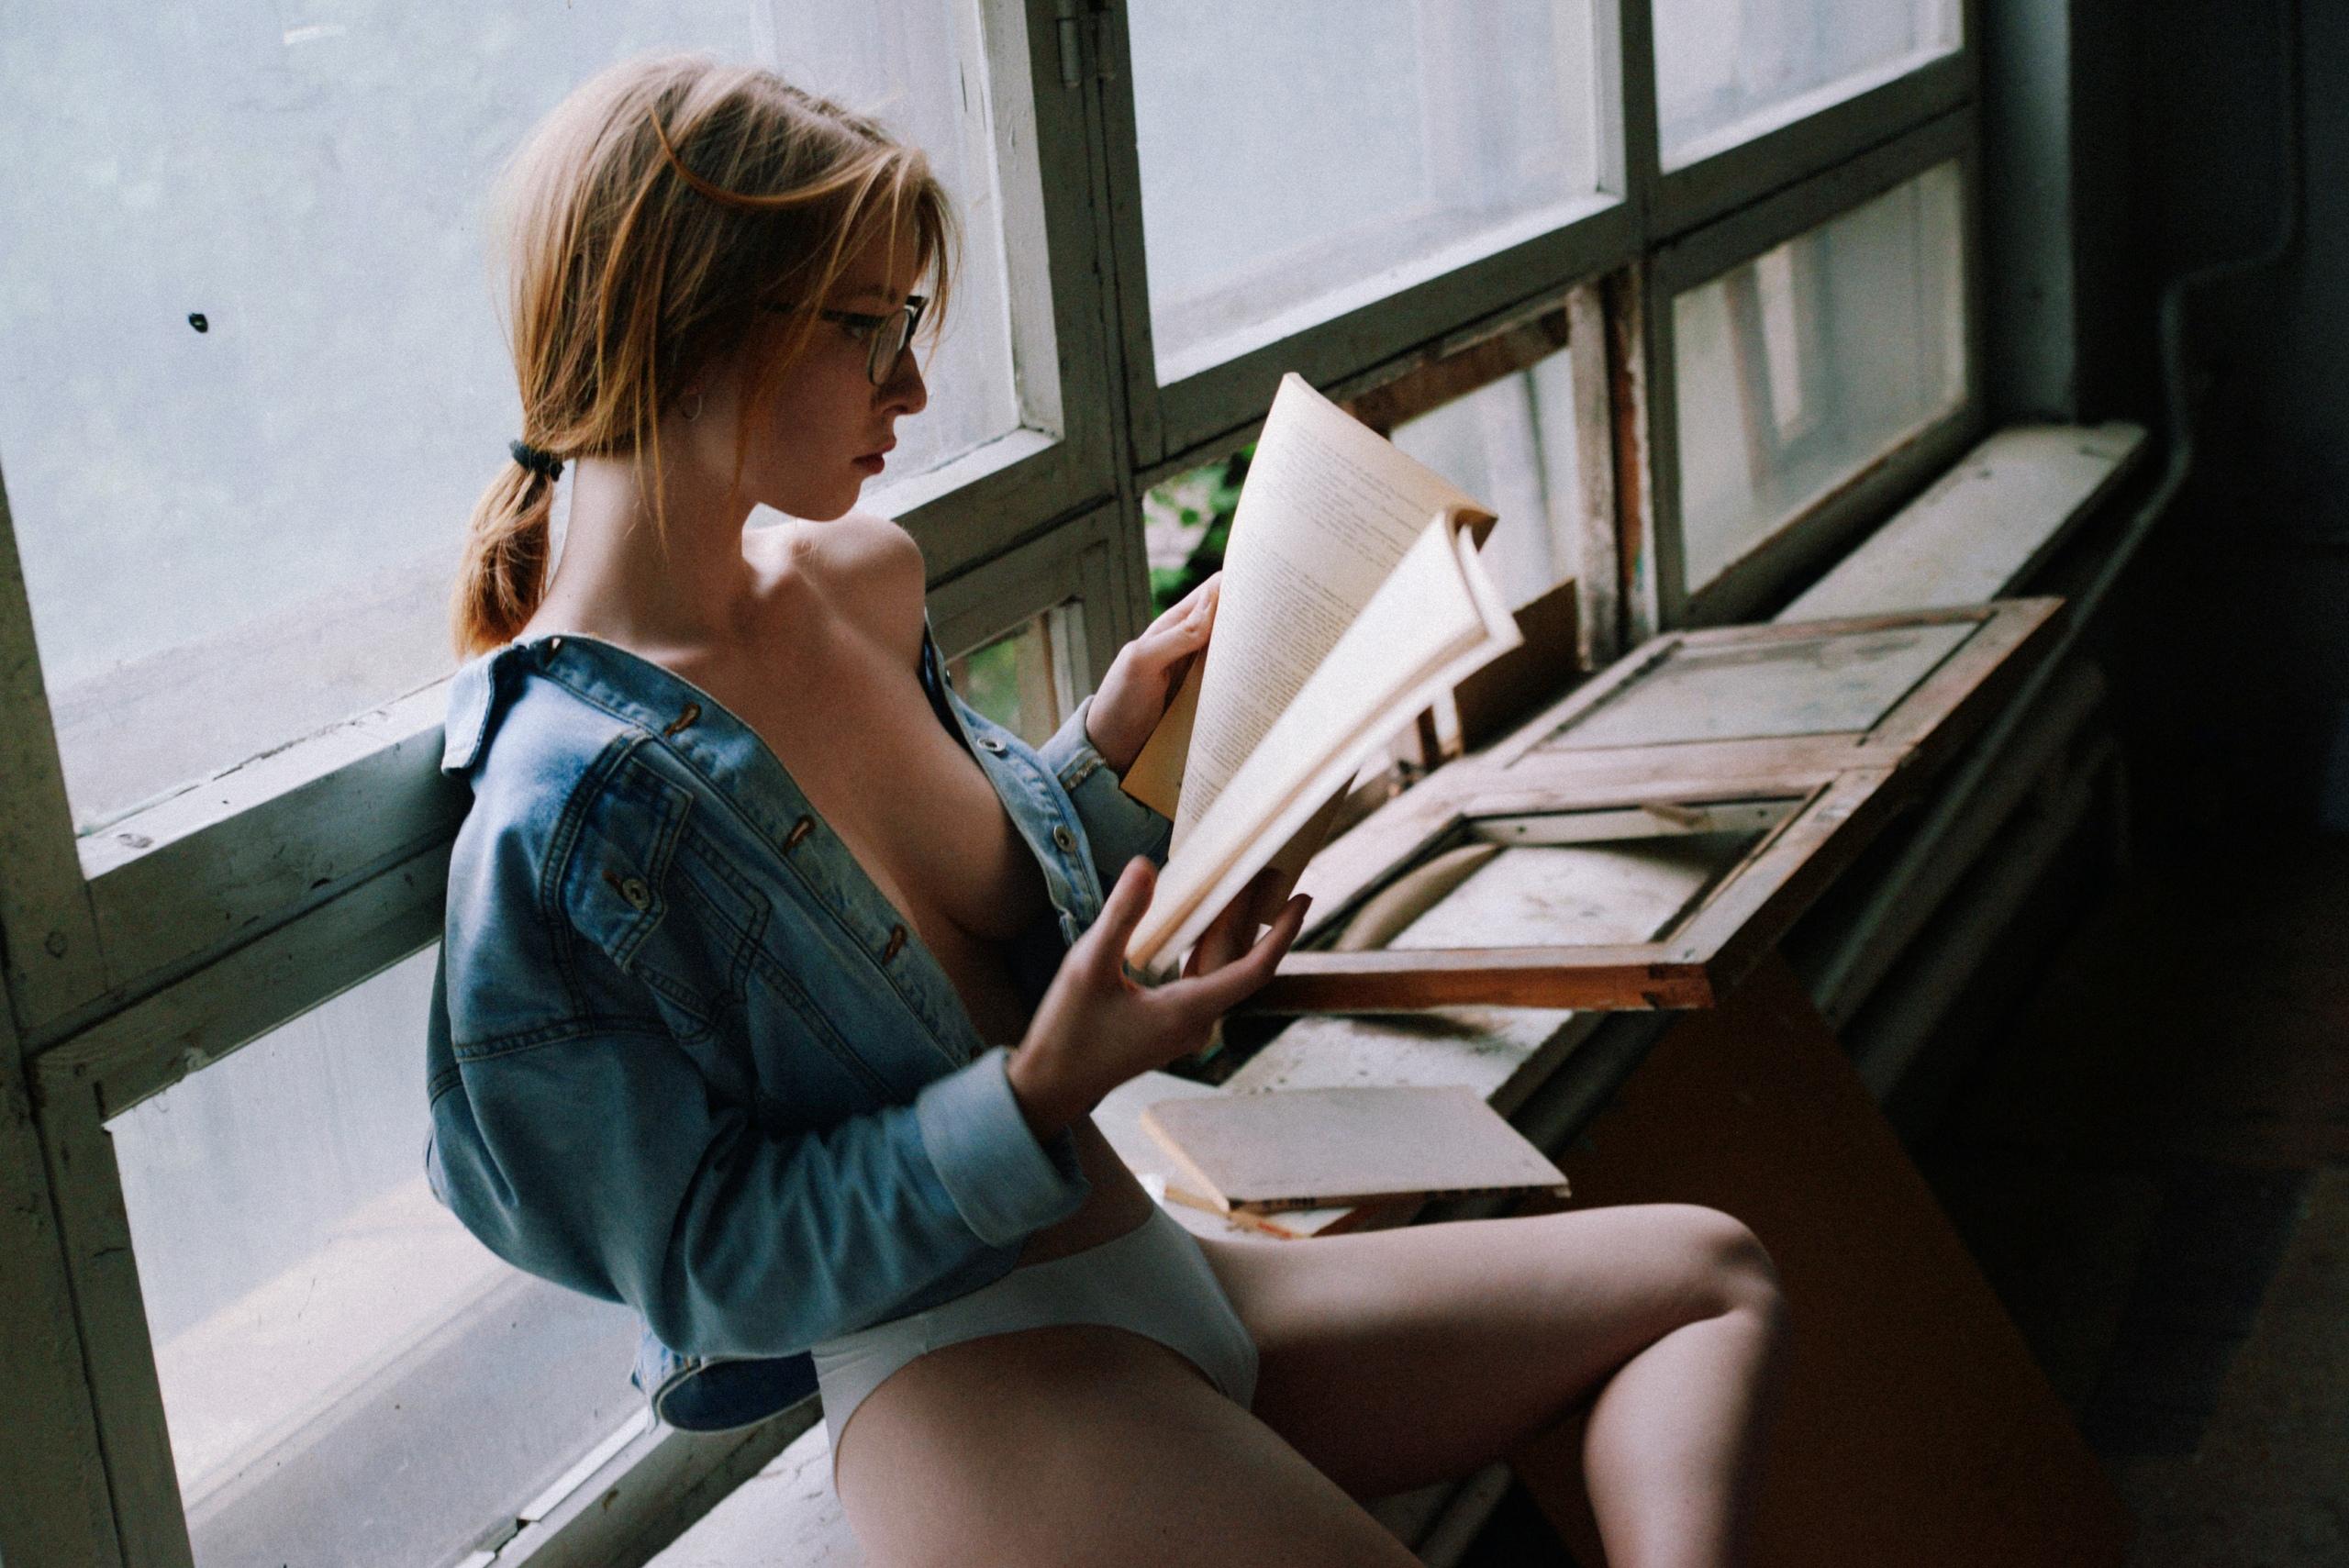 https://youngfolks.ru/pub/model-roma-starkov-32172225